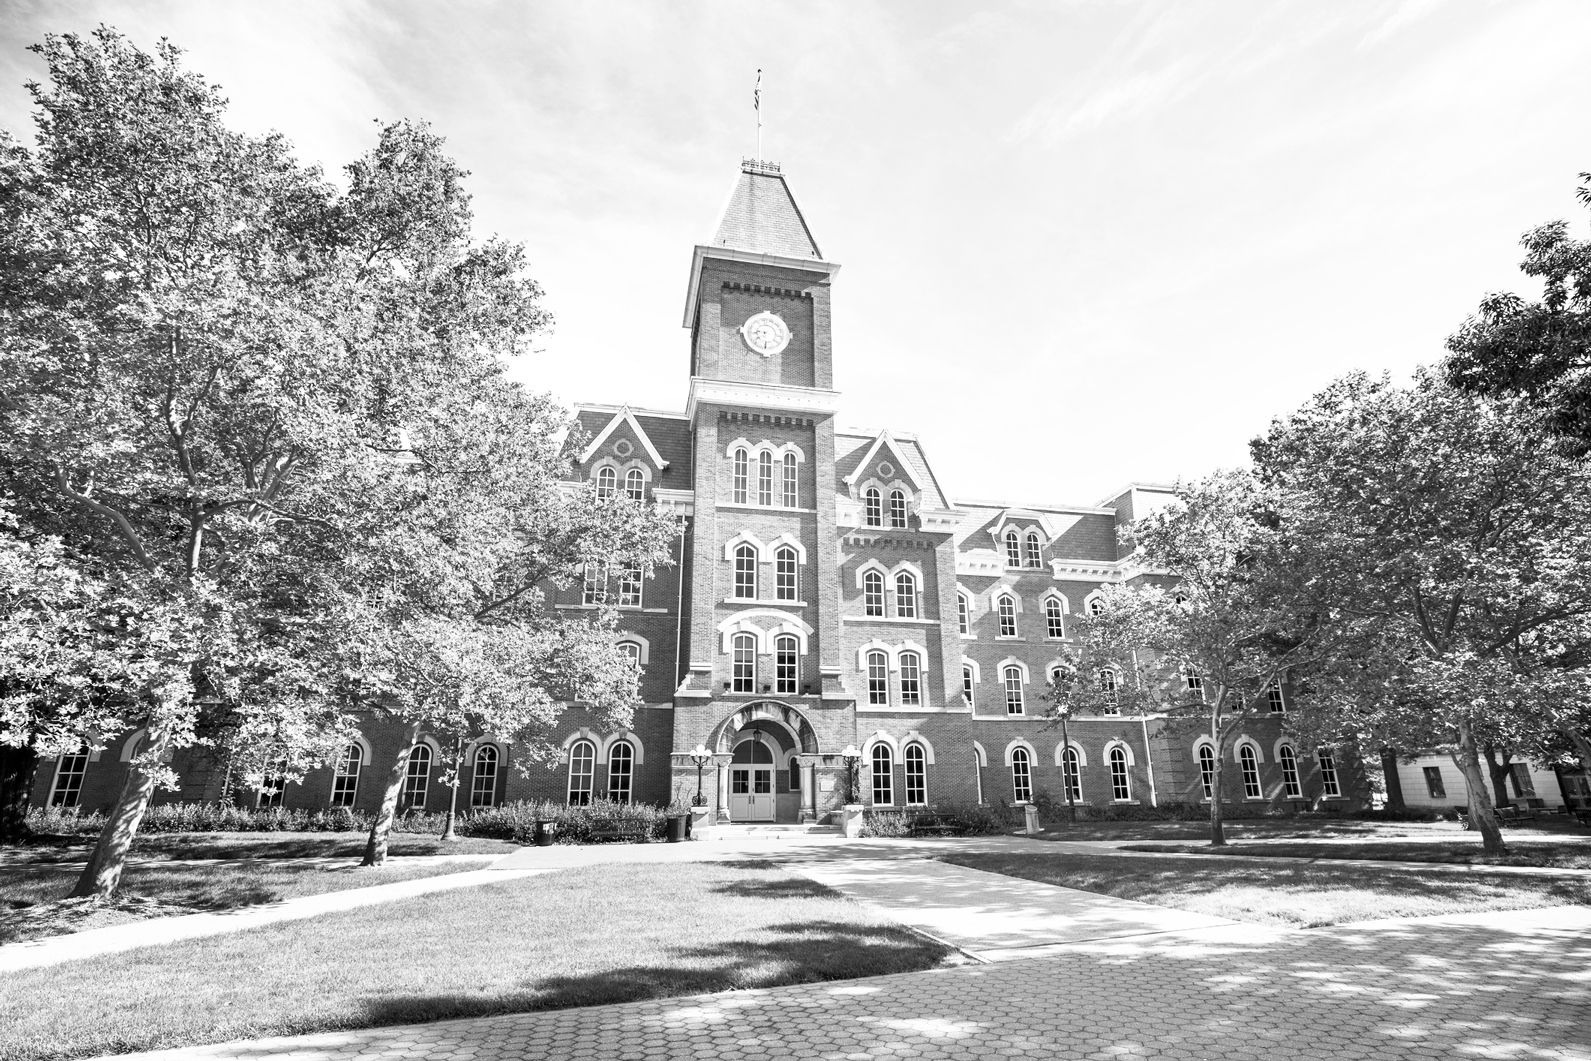 Caxton Ohio University - International Payments